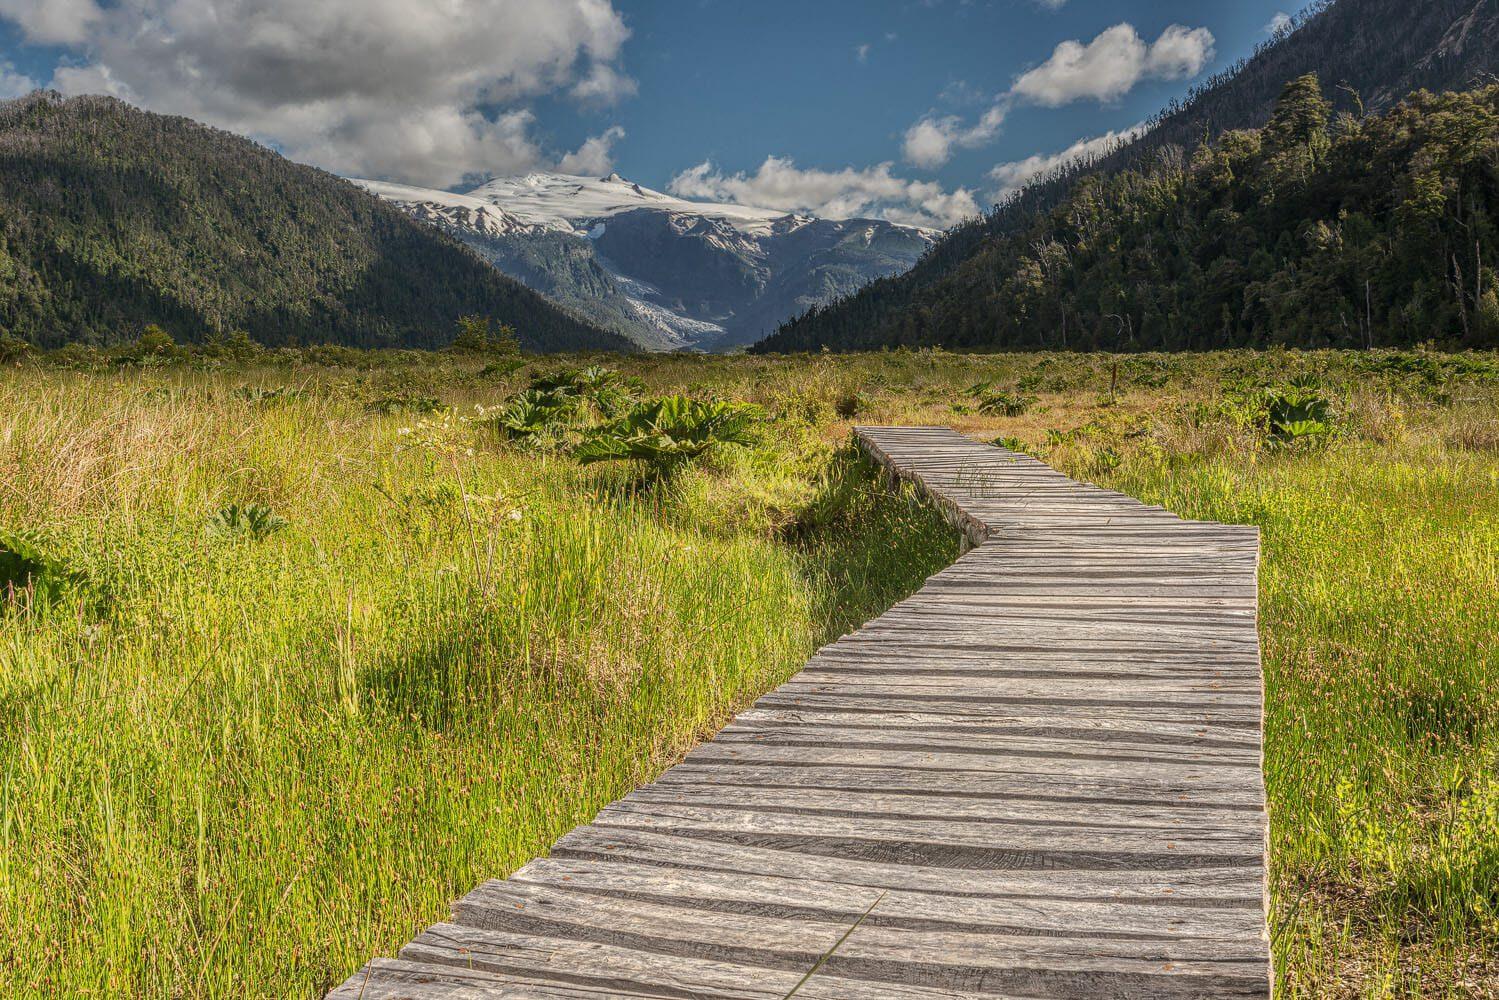 Hiking bridge and path to the Michinmahuida glacier - Pumalin national park